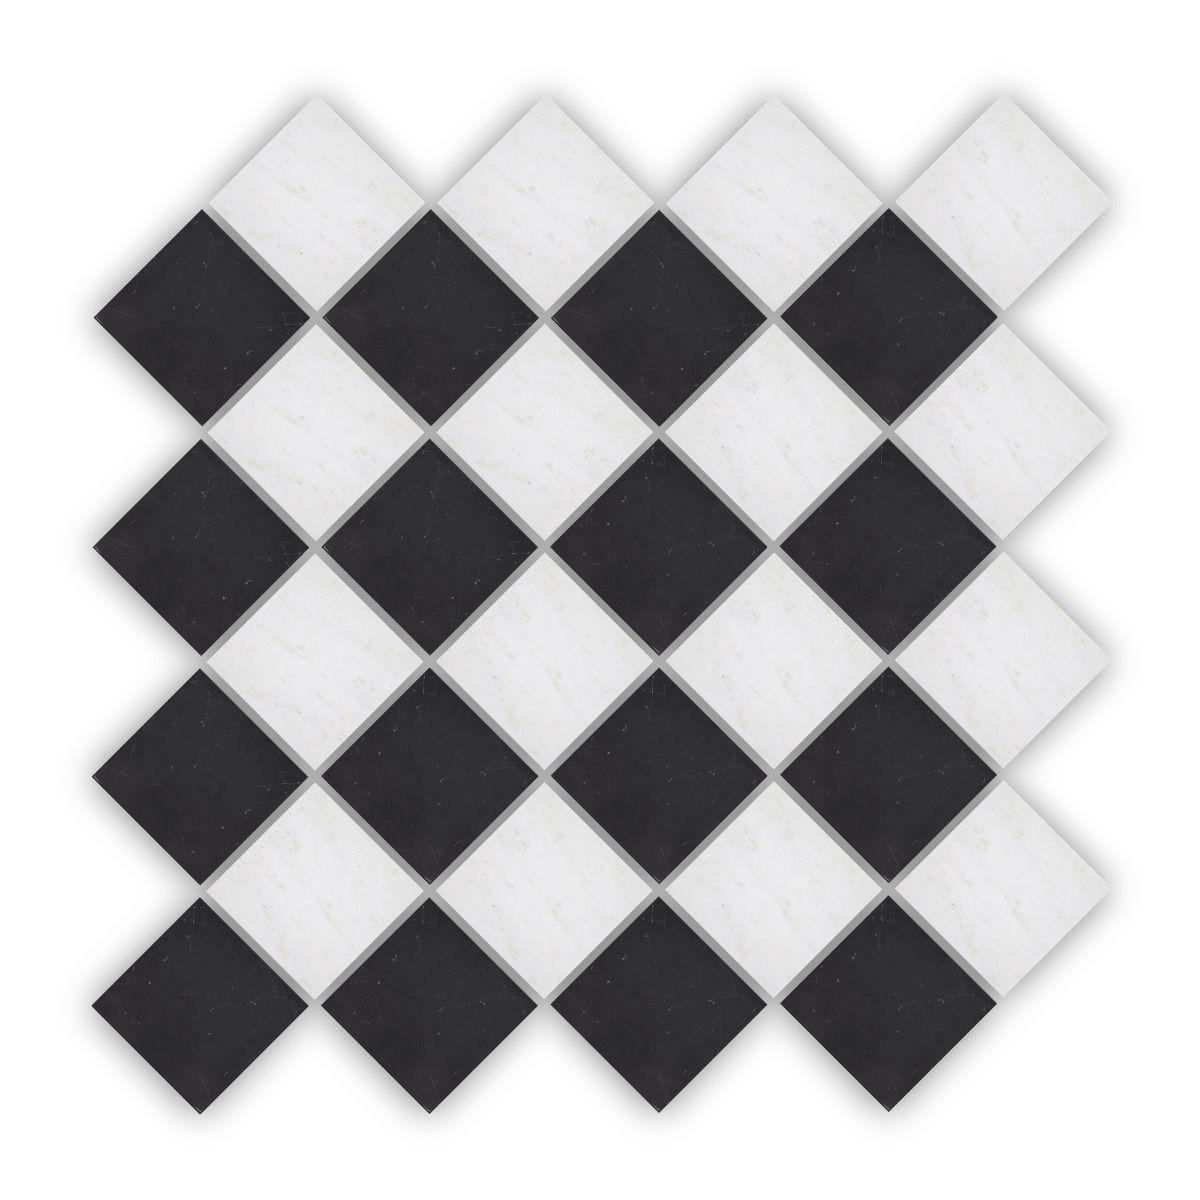 Chequers Court 4.8sq White & Black bevelled edge